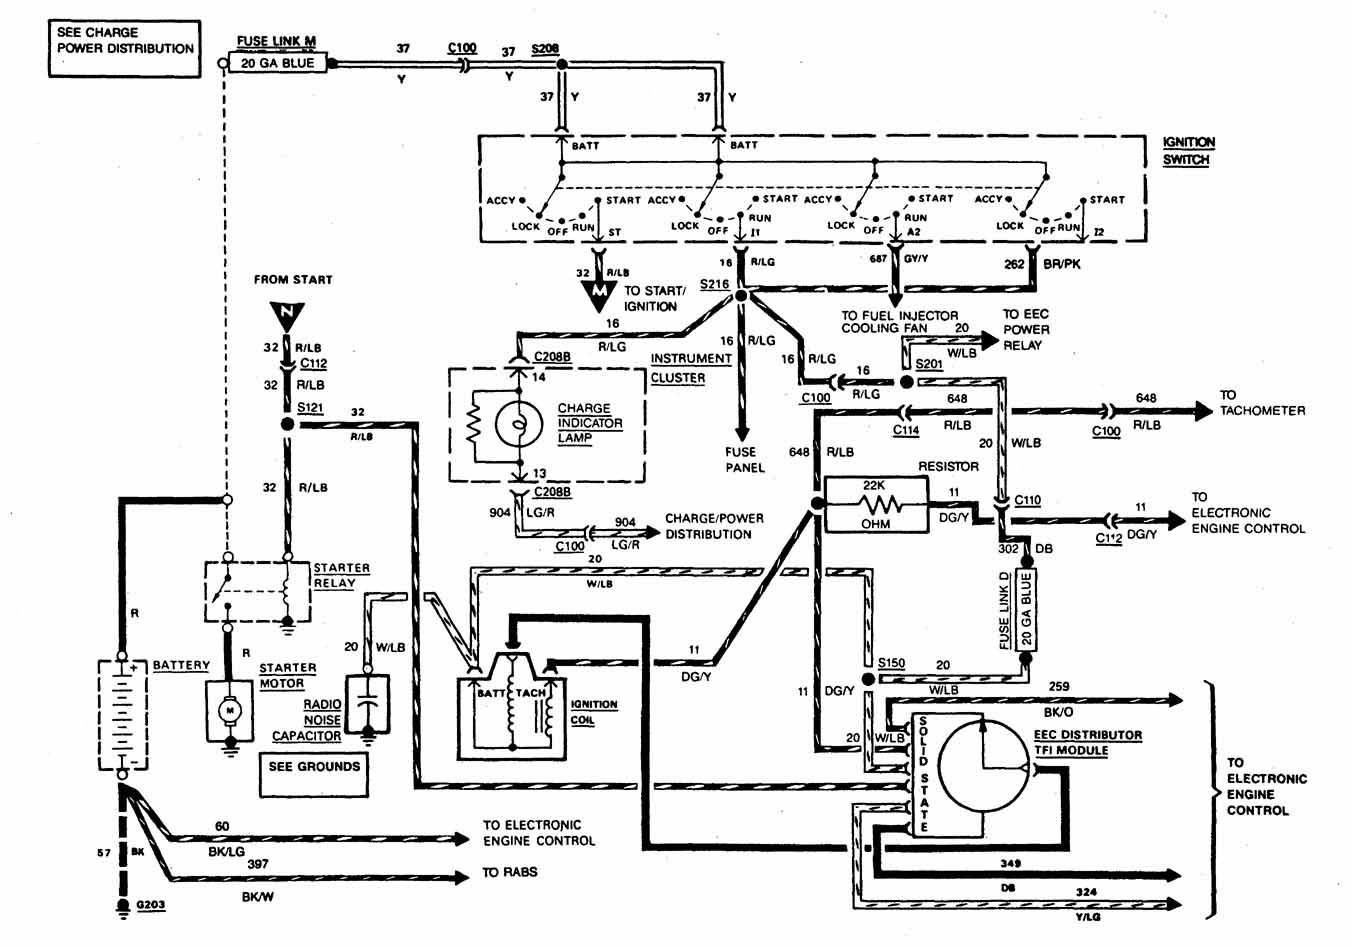 ford bronco starter solenoid wiring diagram 1986 fj1200 1987 ranger example electrical rh huntervalleyhotels co 1990 fuse